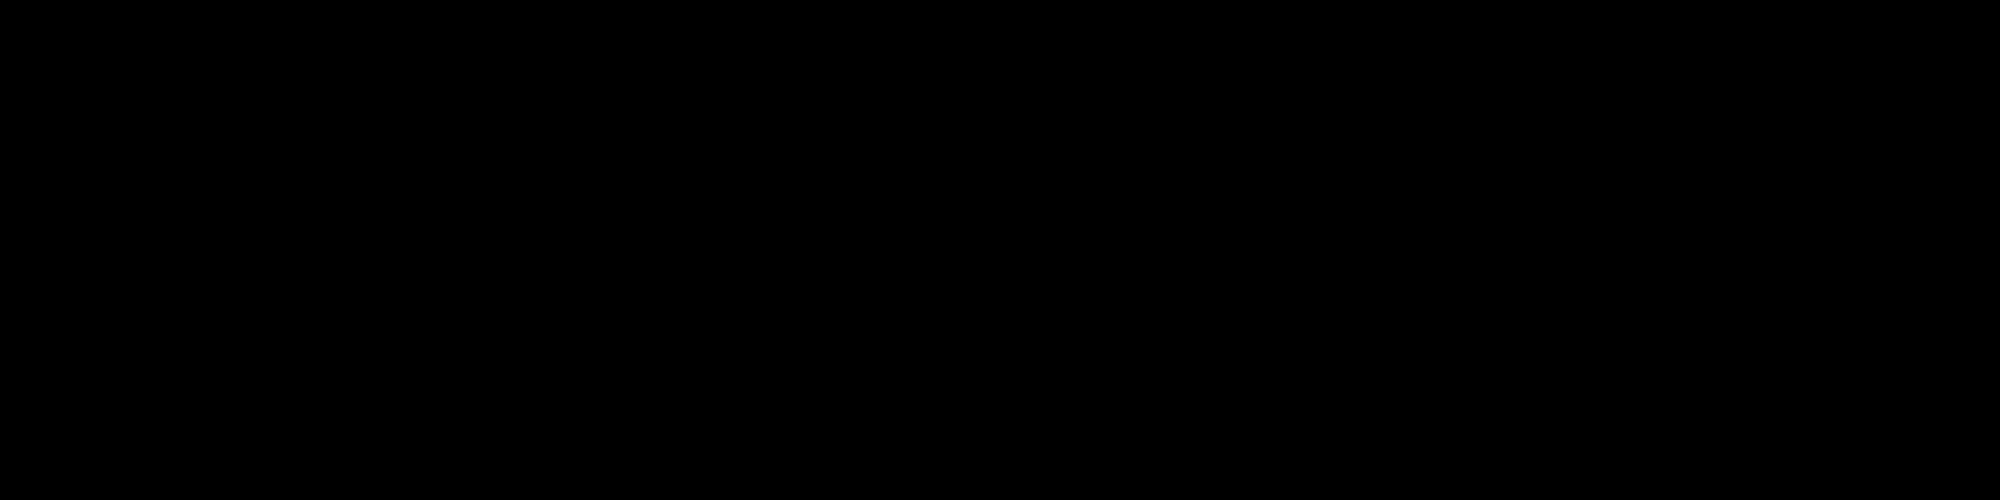 Maligator